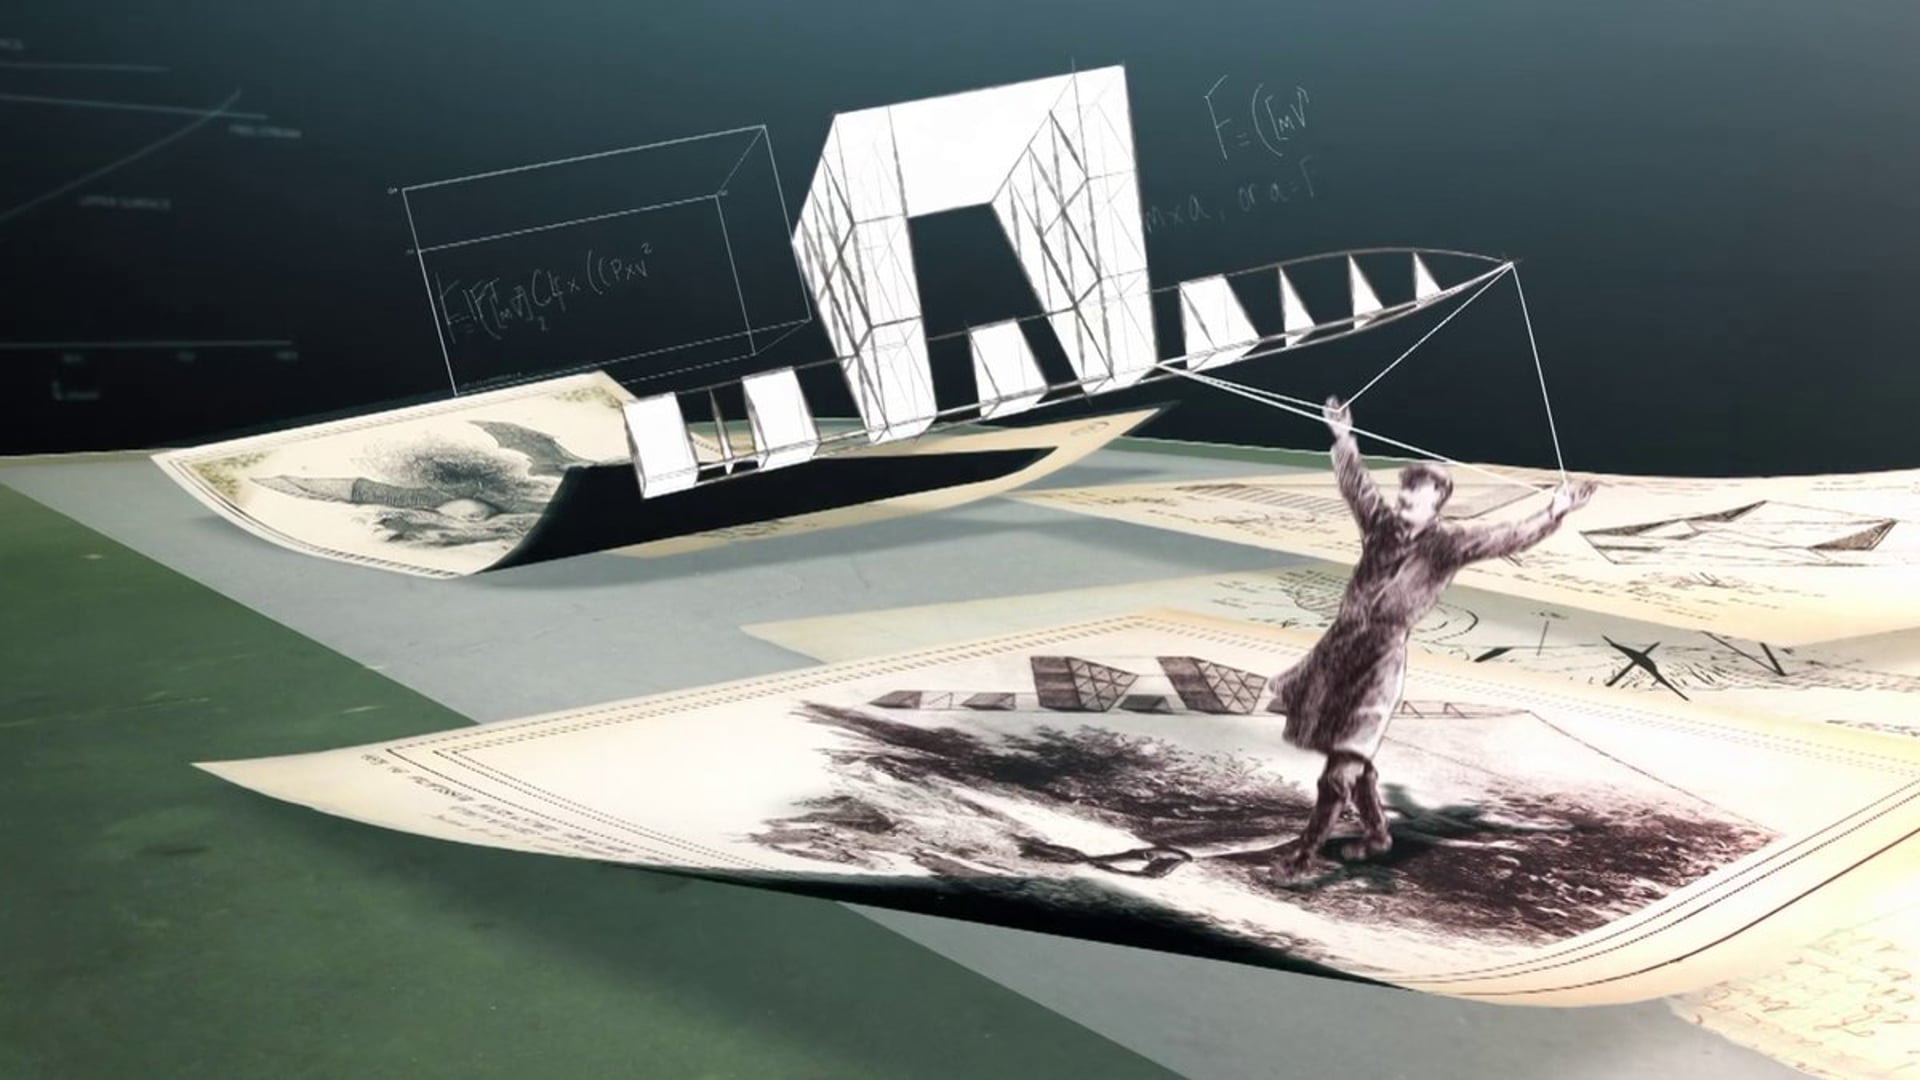 Kennedy Space Center - Space Shuttle Atlantis Exhibit Featured Presentation Video